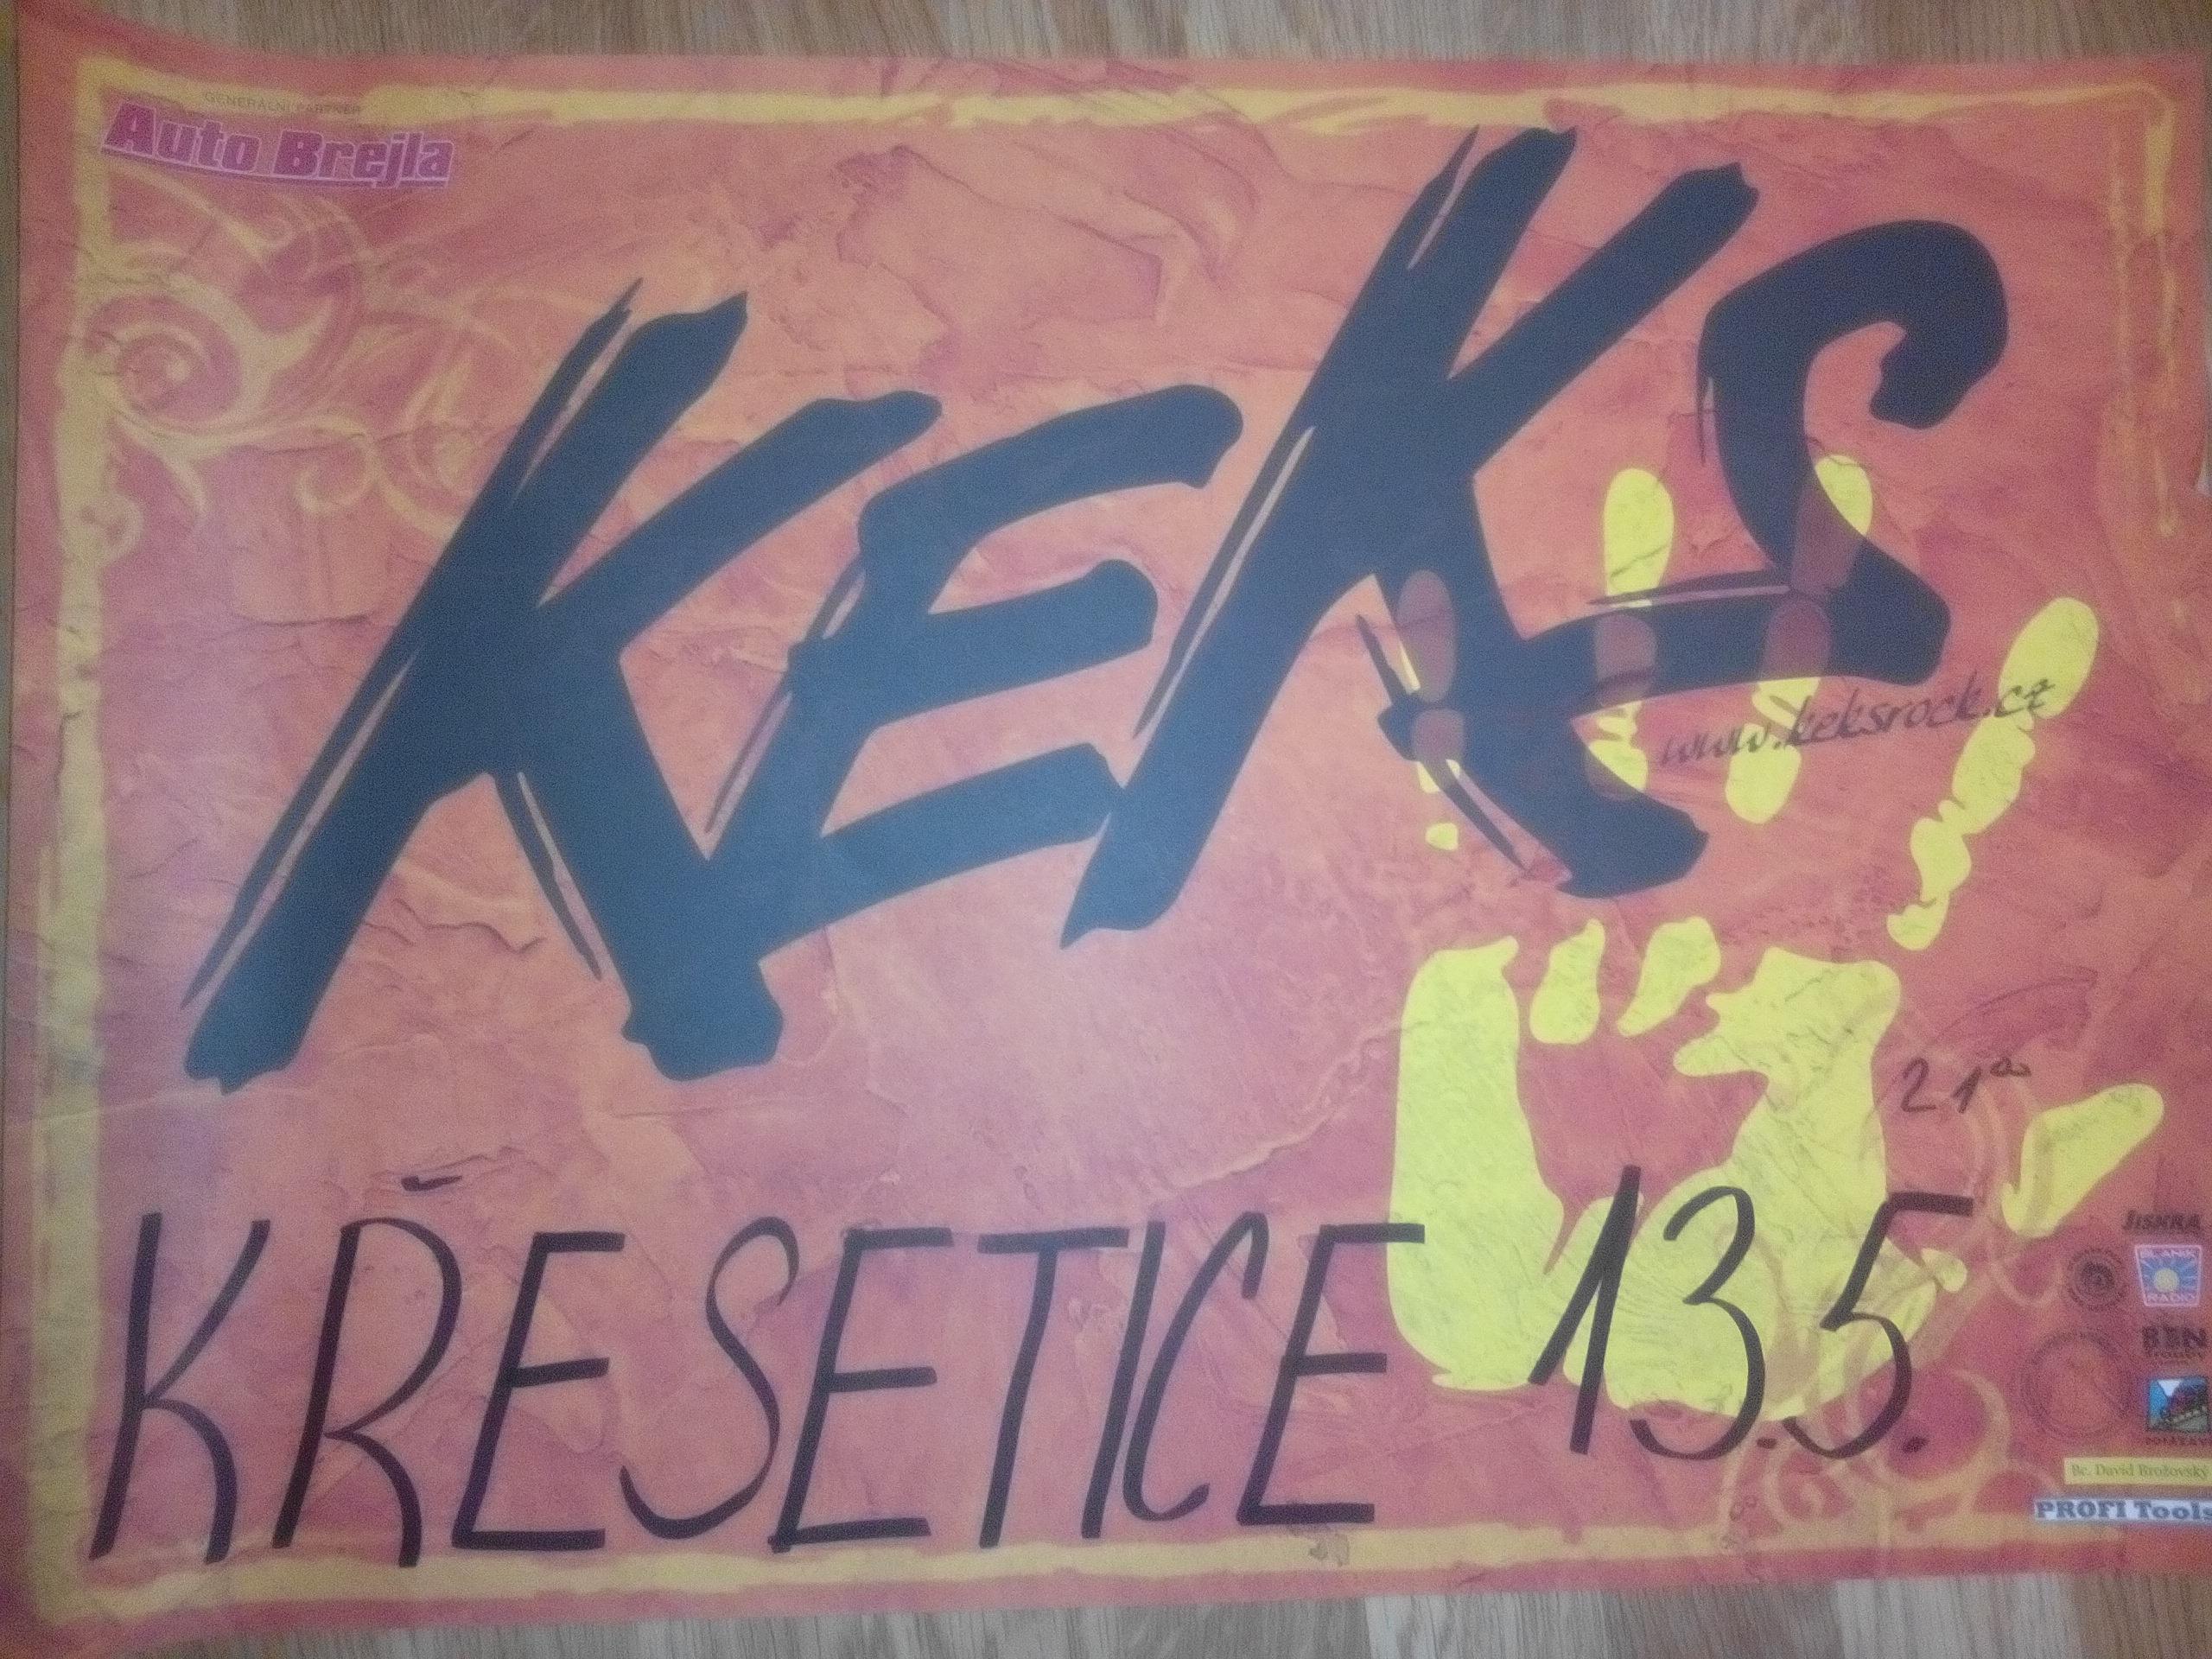 325-keks-kresetice.jpg